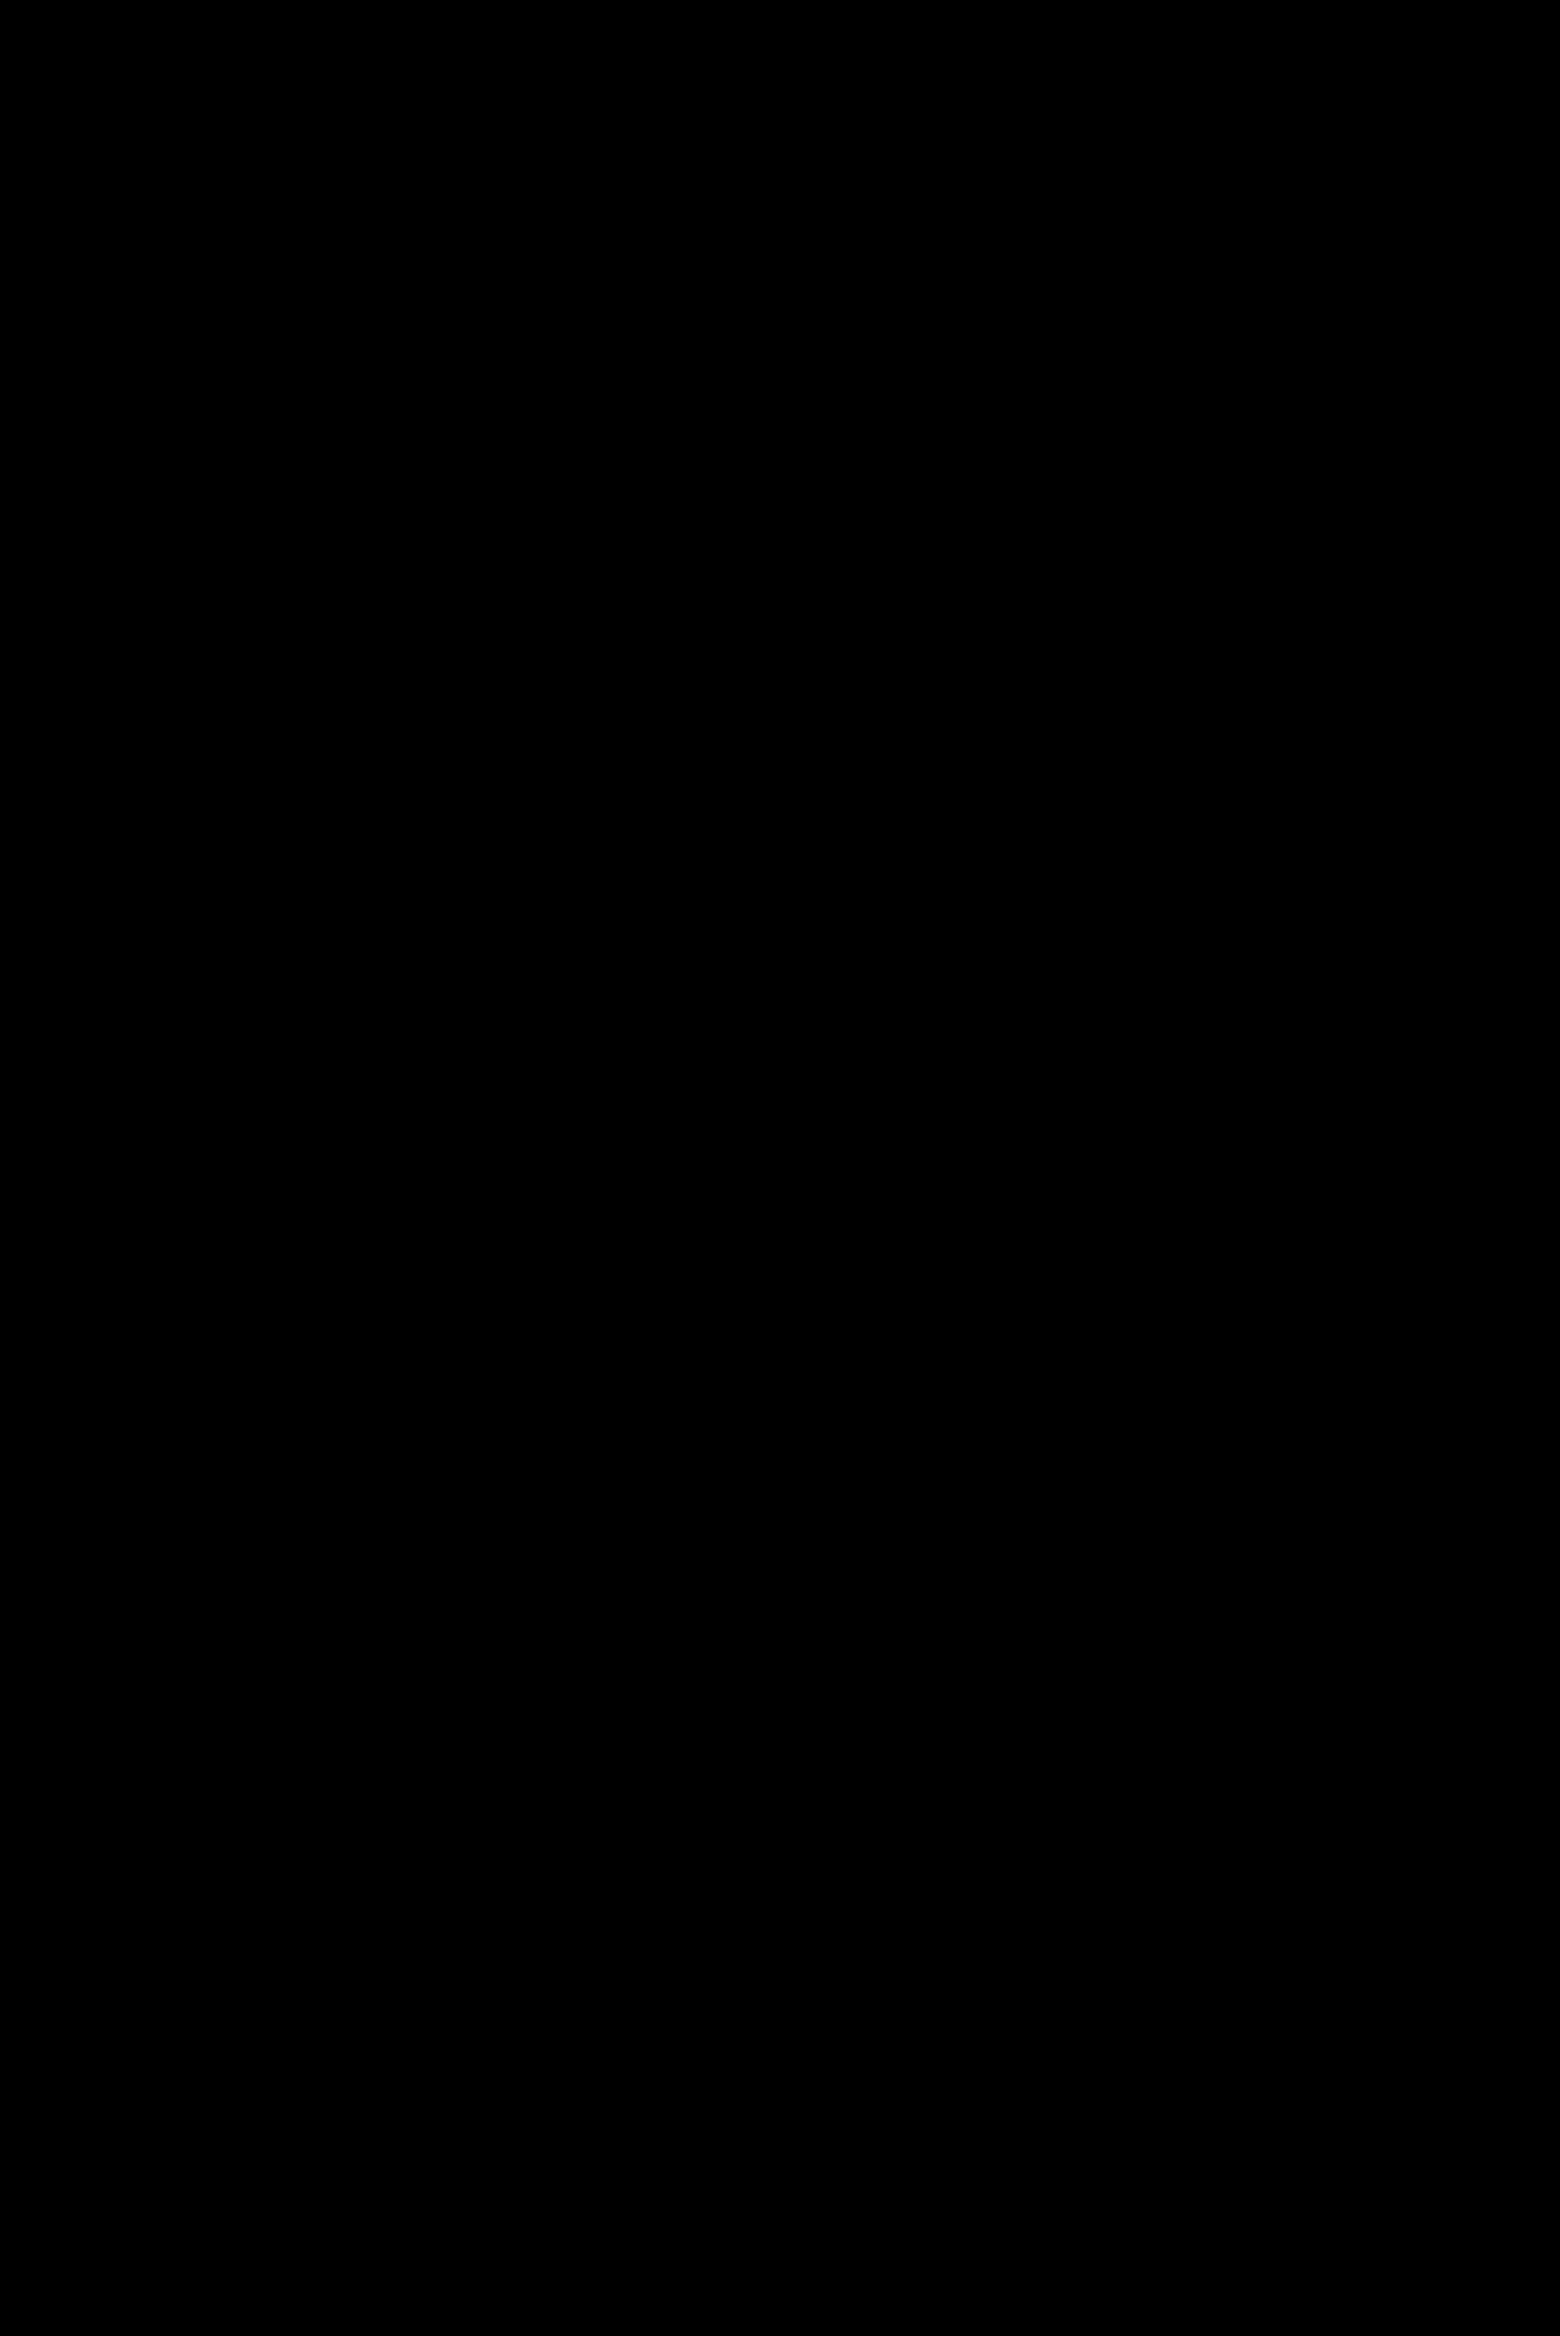 Big Image - Dragon Tattoo Black And White (1560x2336)